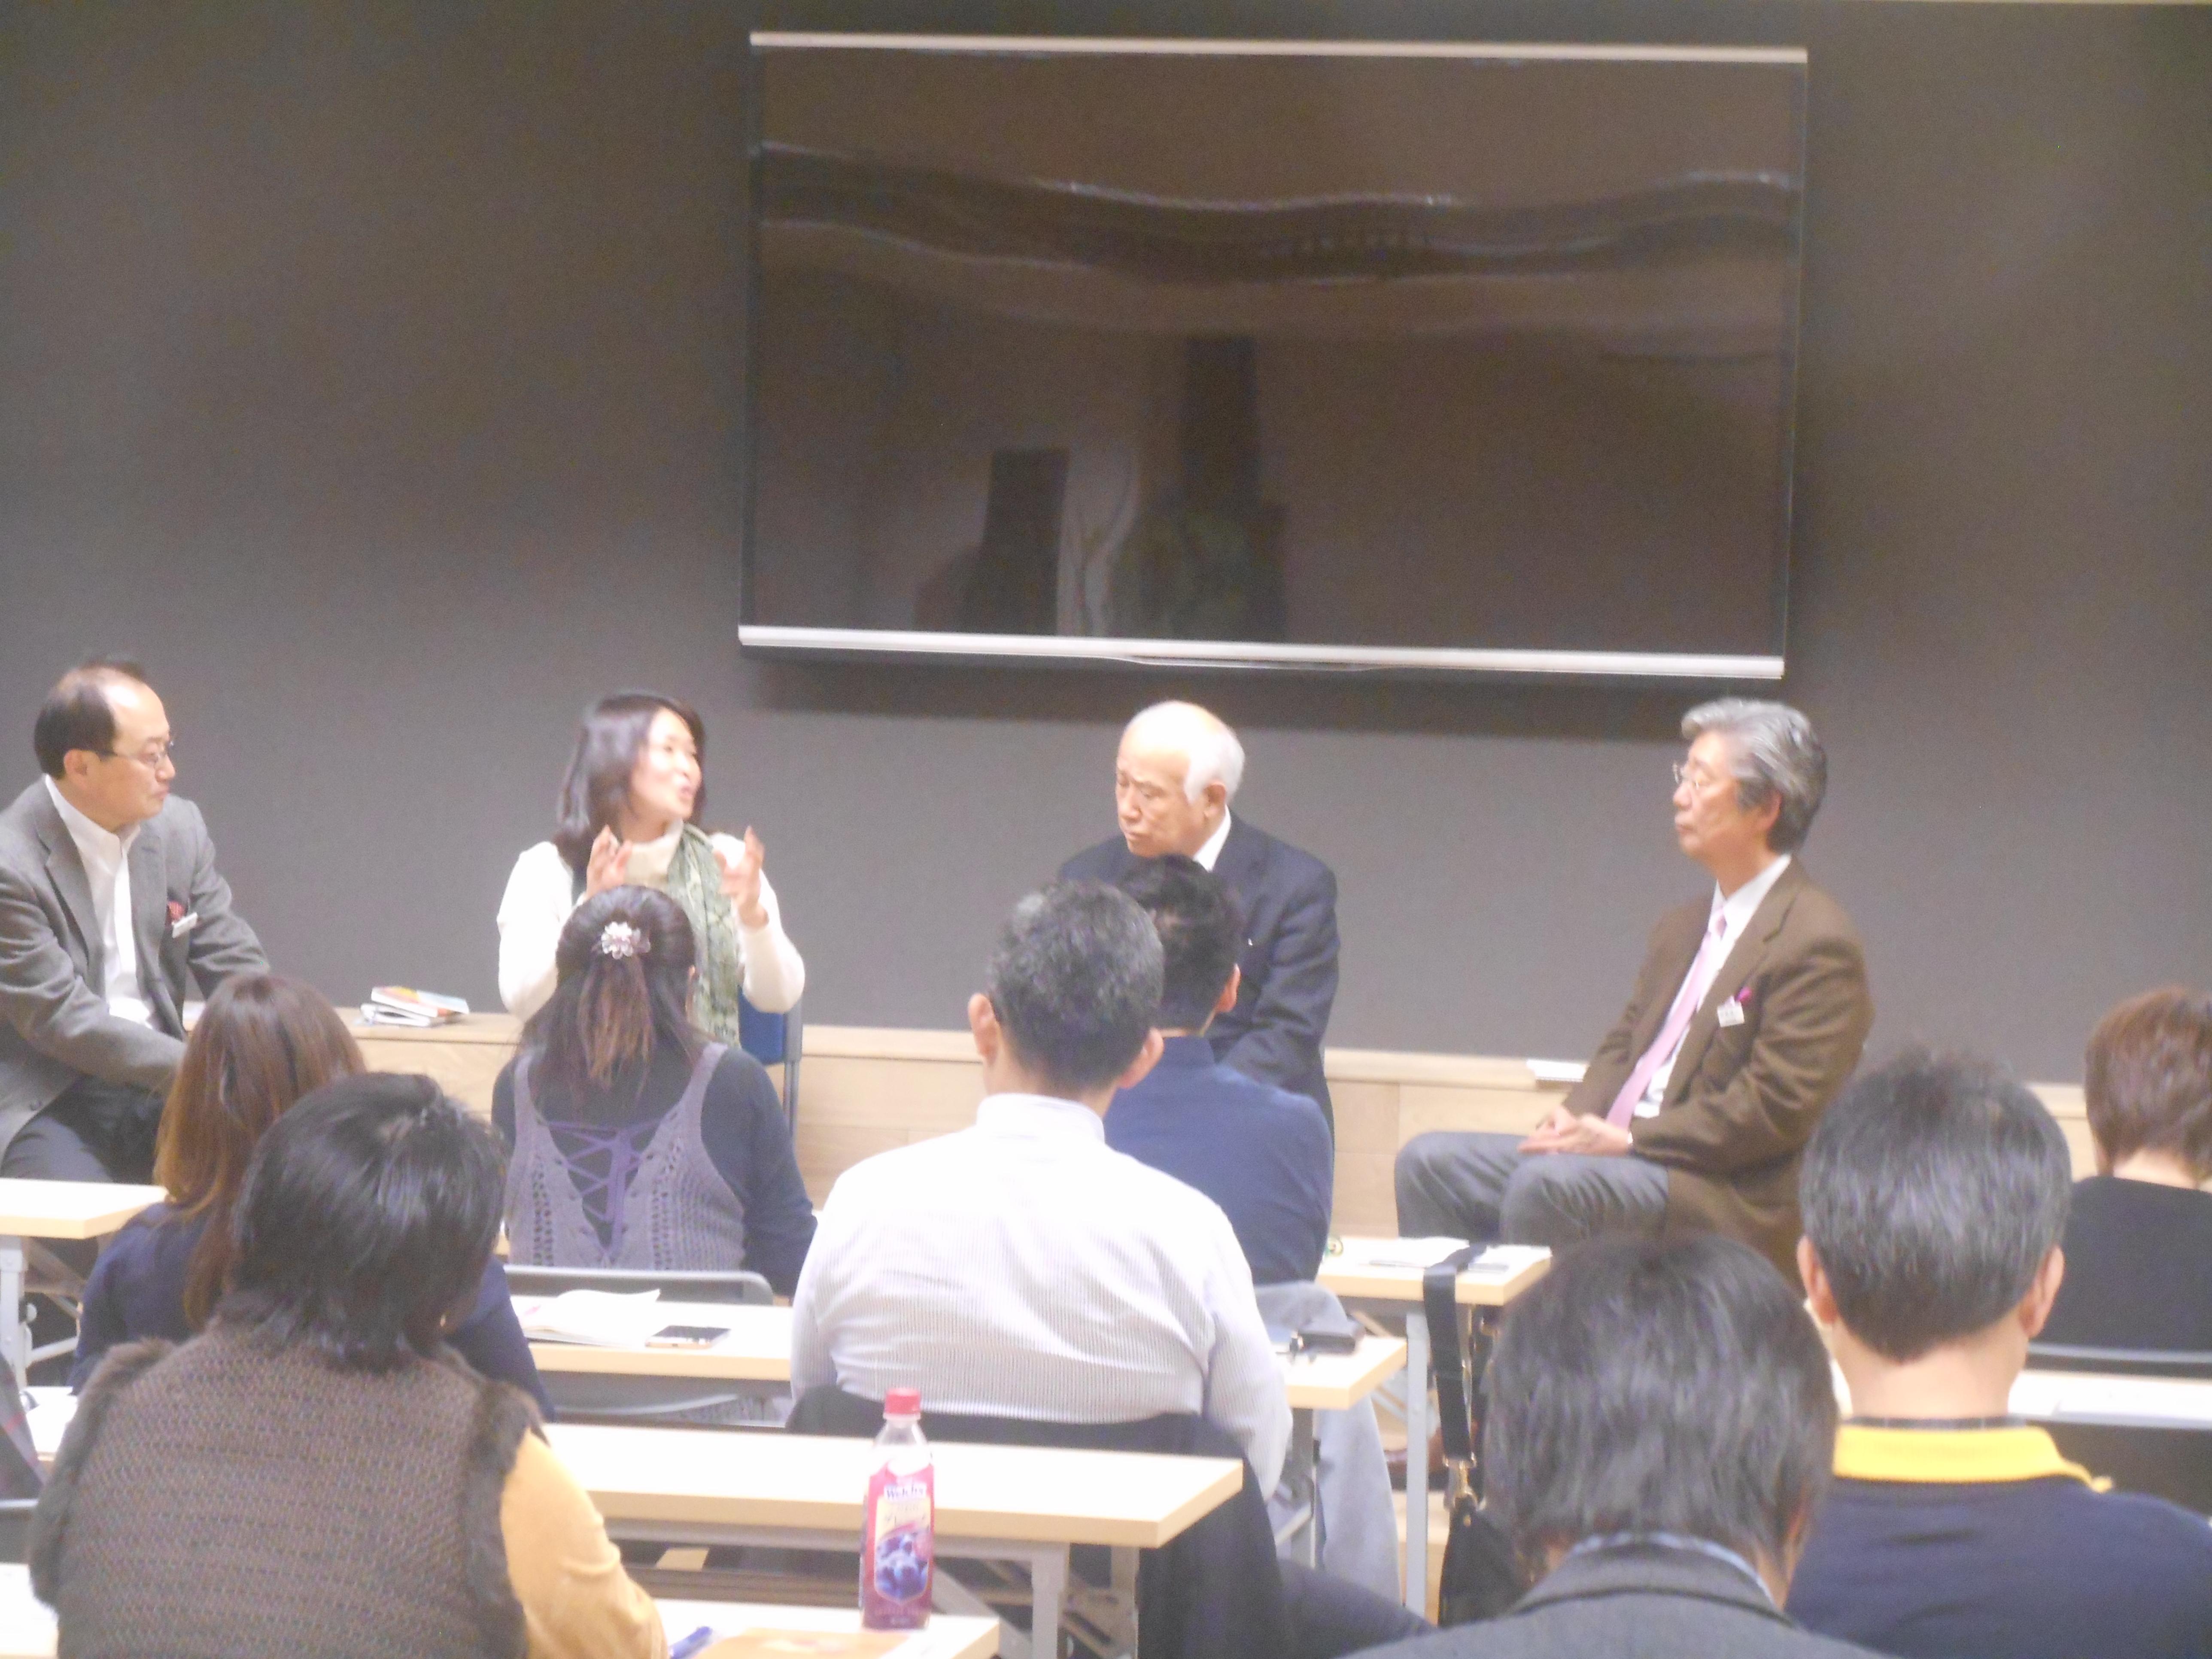 DSCN0498 1 - 平成30年度 東京思風塾 4月7日(土)「時代が問題をつくり、問題が人物をつくる」